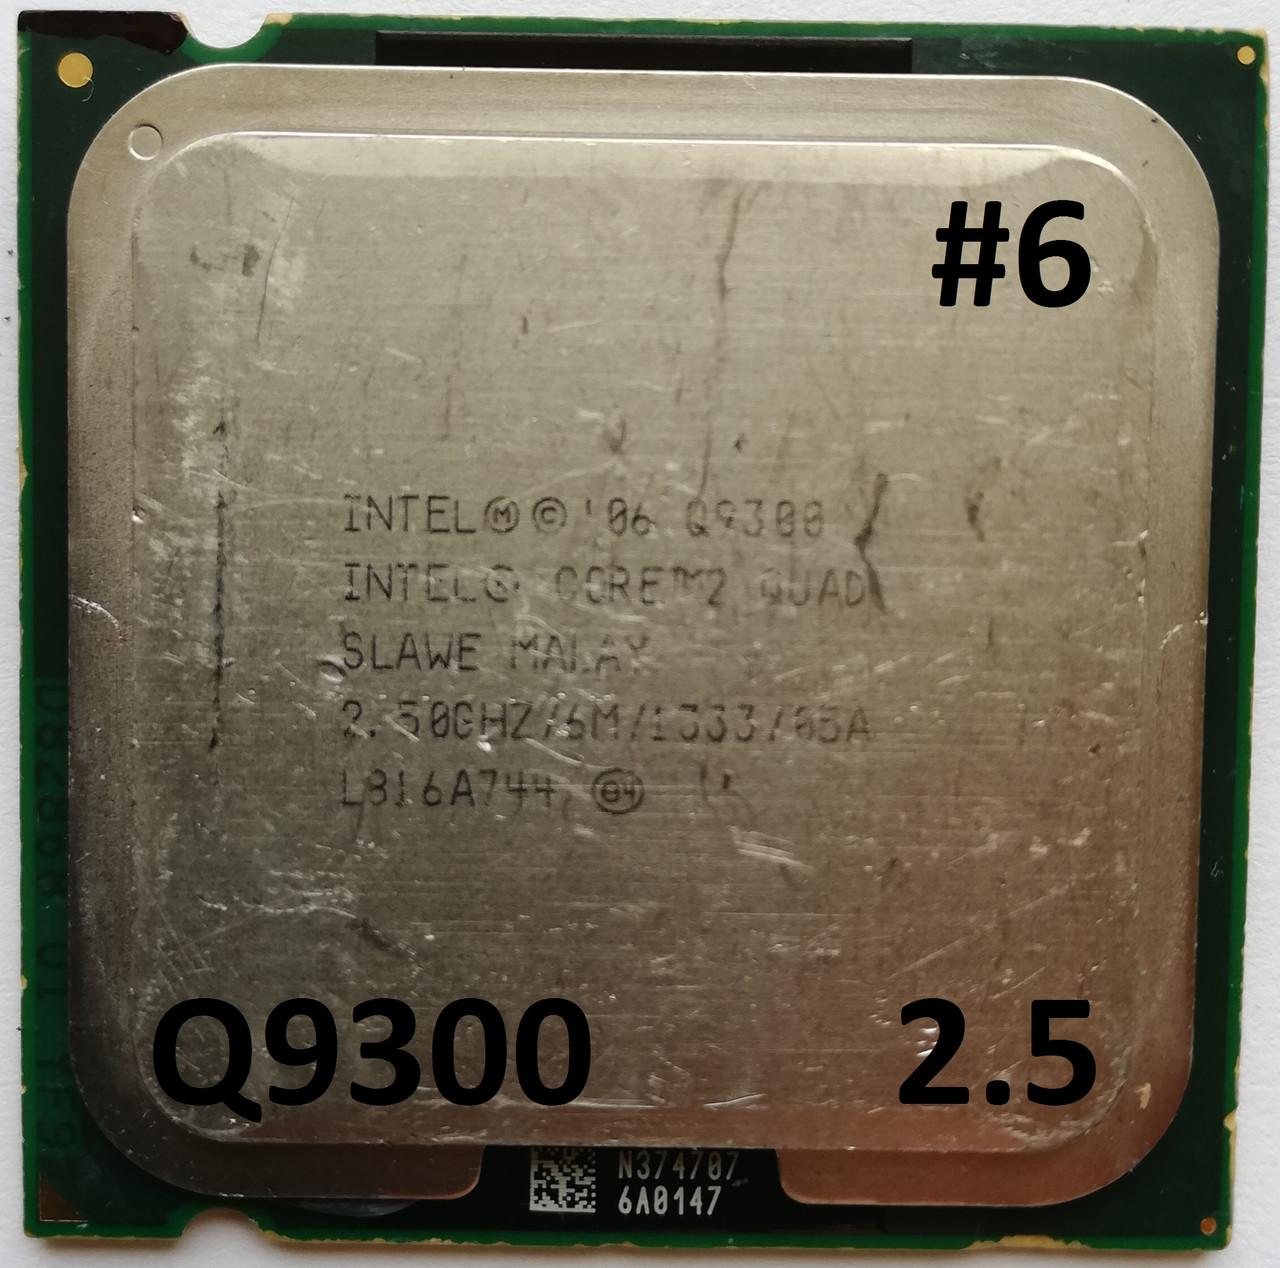 Процессор ЛОТ#6 Intel® Core™2 Quad Q9300 M1 SLAWE 2.5GHz 6M Cache 1333 MHz FSB Socket 775 Б/У